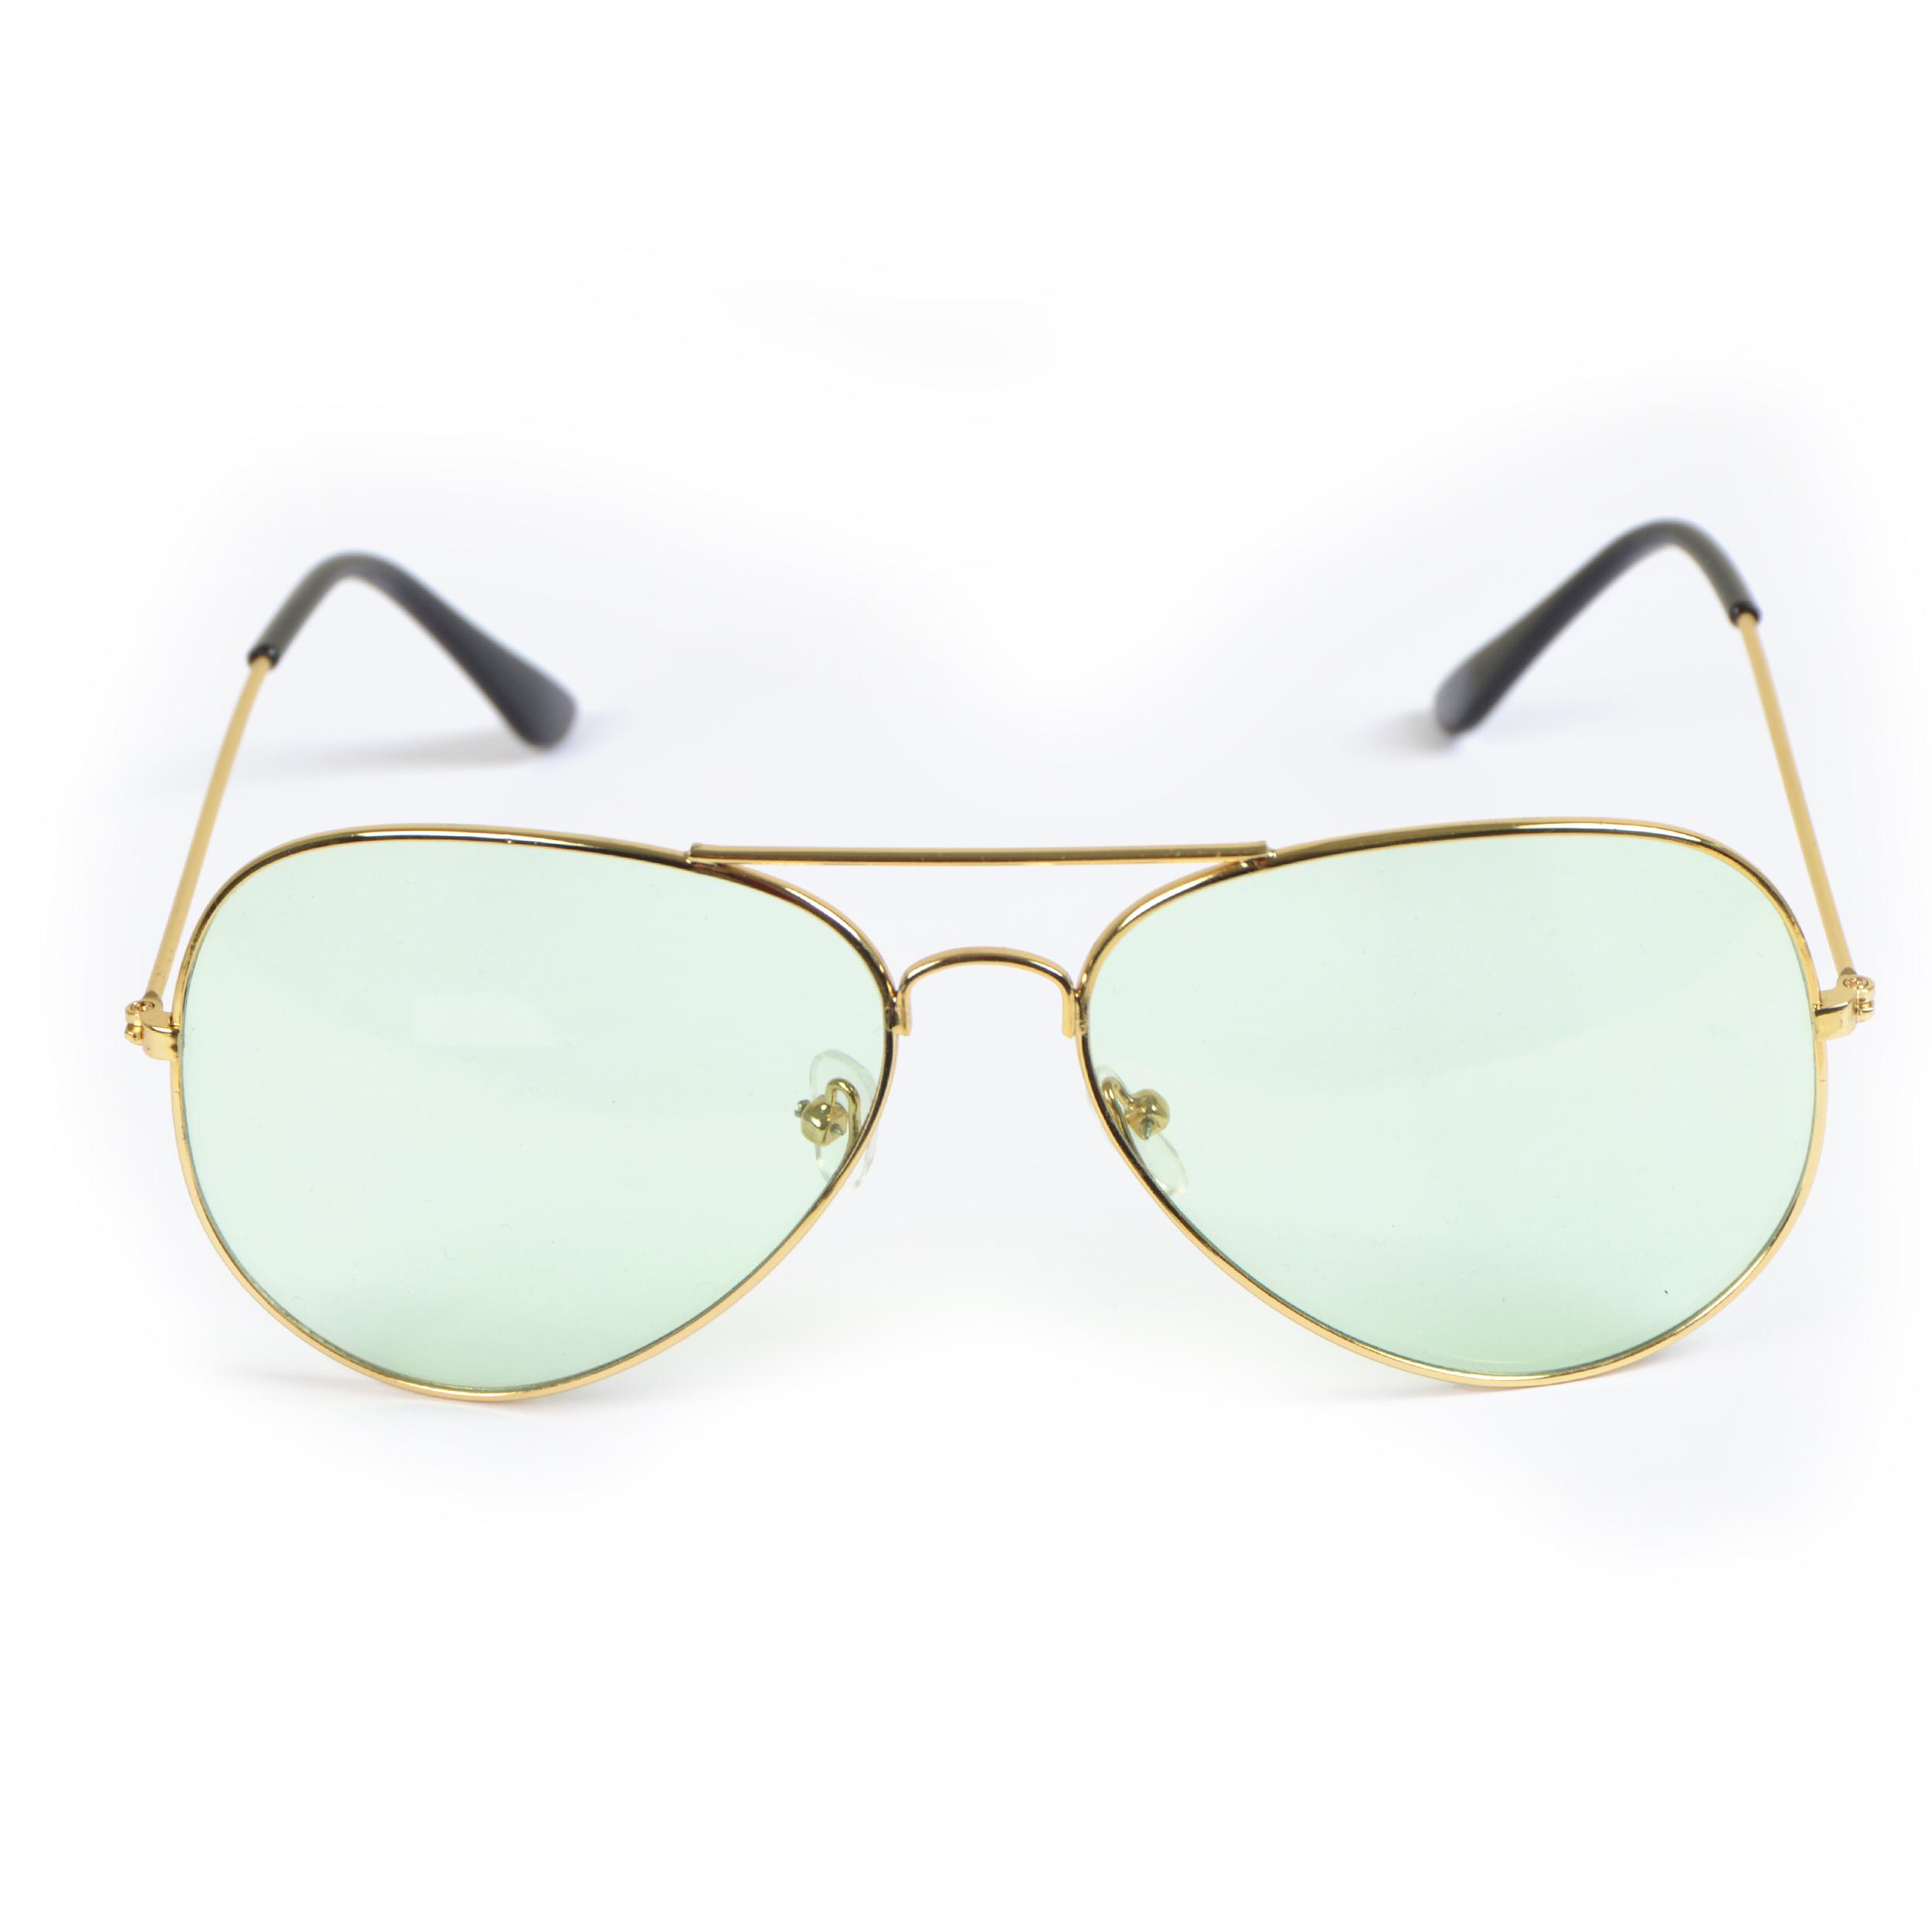 Sonnenbrille, Light, Pilotenbrille - Goldfassung, Gläser Hell-grün